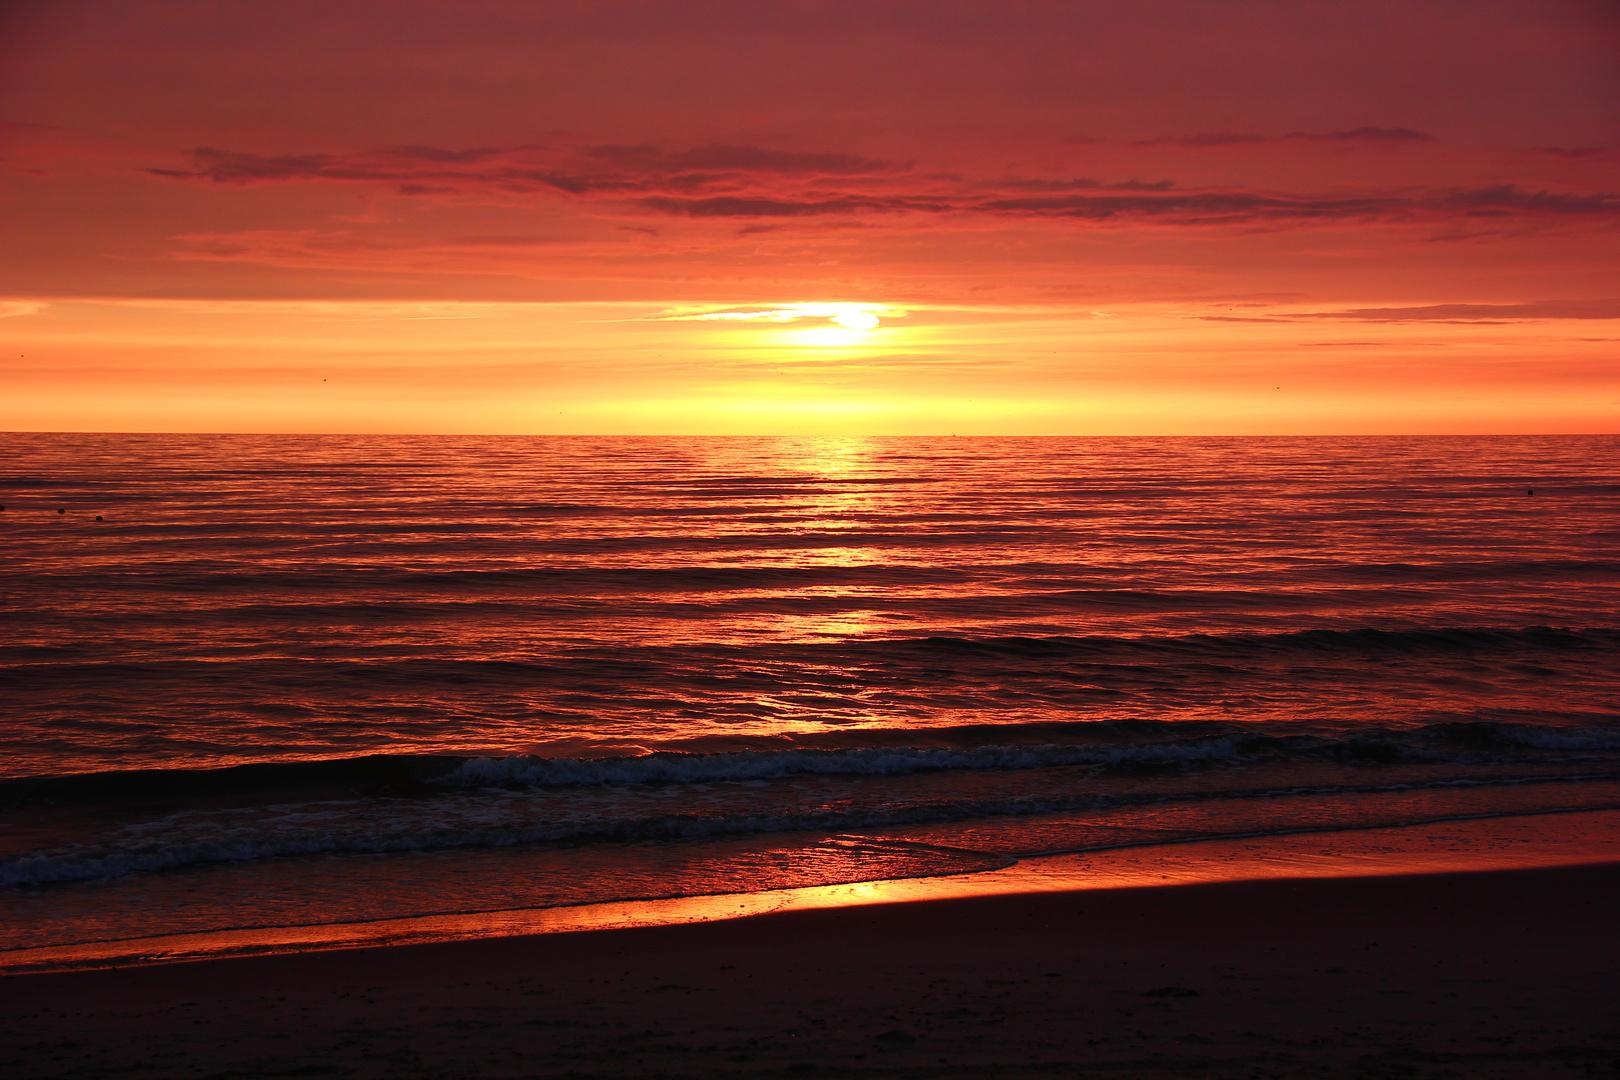 Sonnenuntergang am Meer in Nordholland